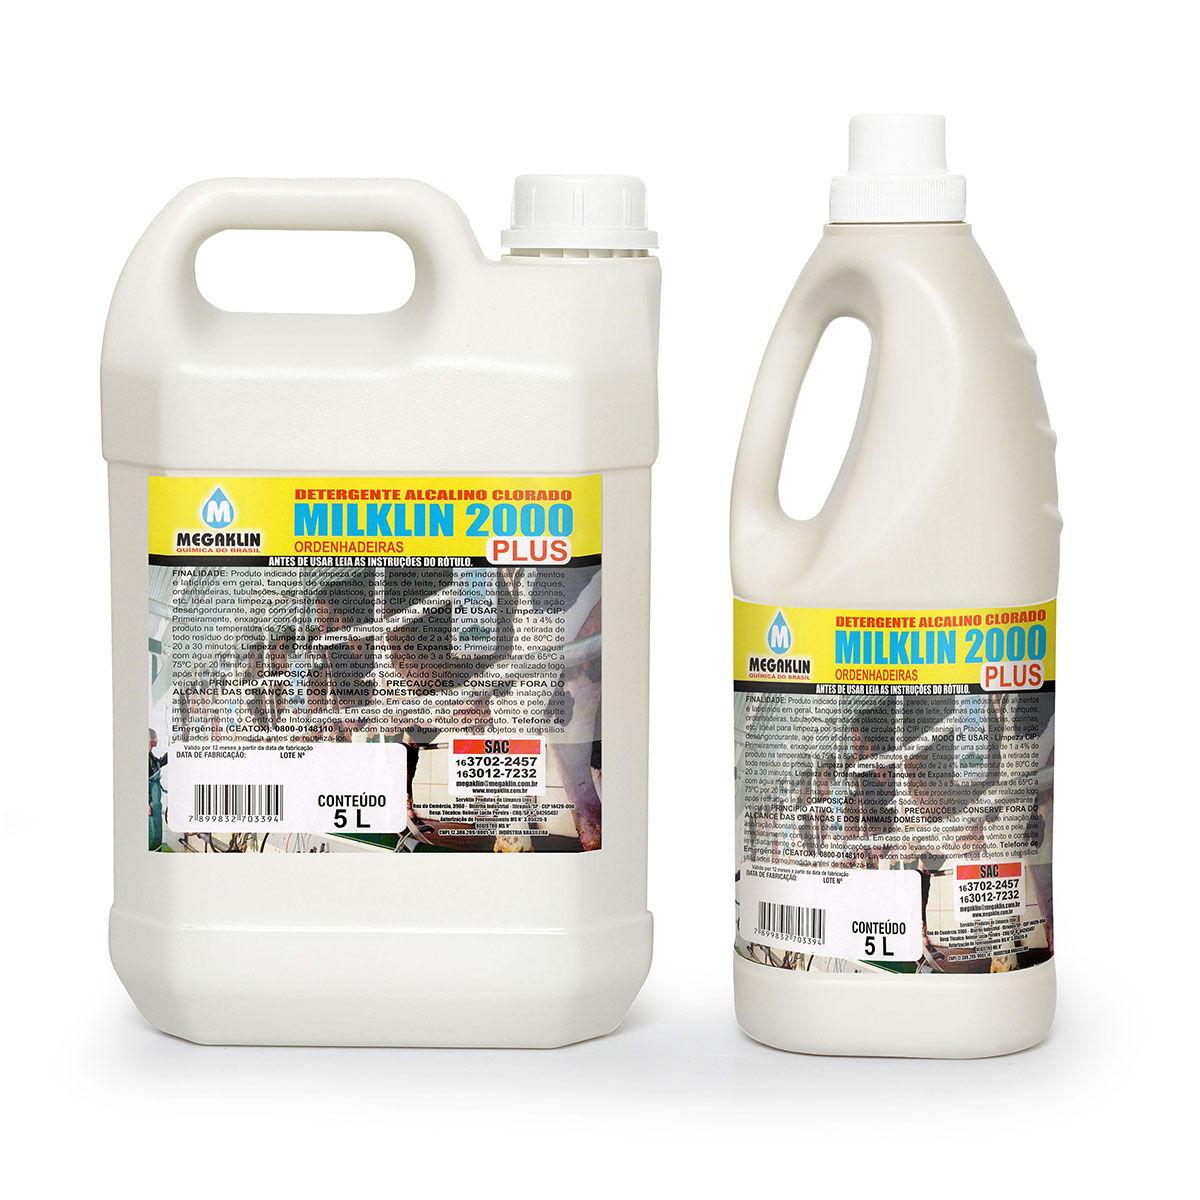 Detergente Alcalino Clorado Ordenhadeiras Milklin 2000 Plus Megaklin